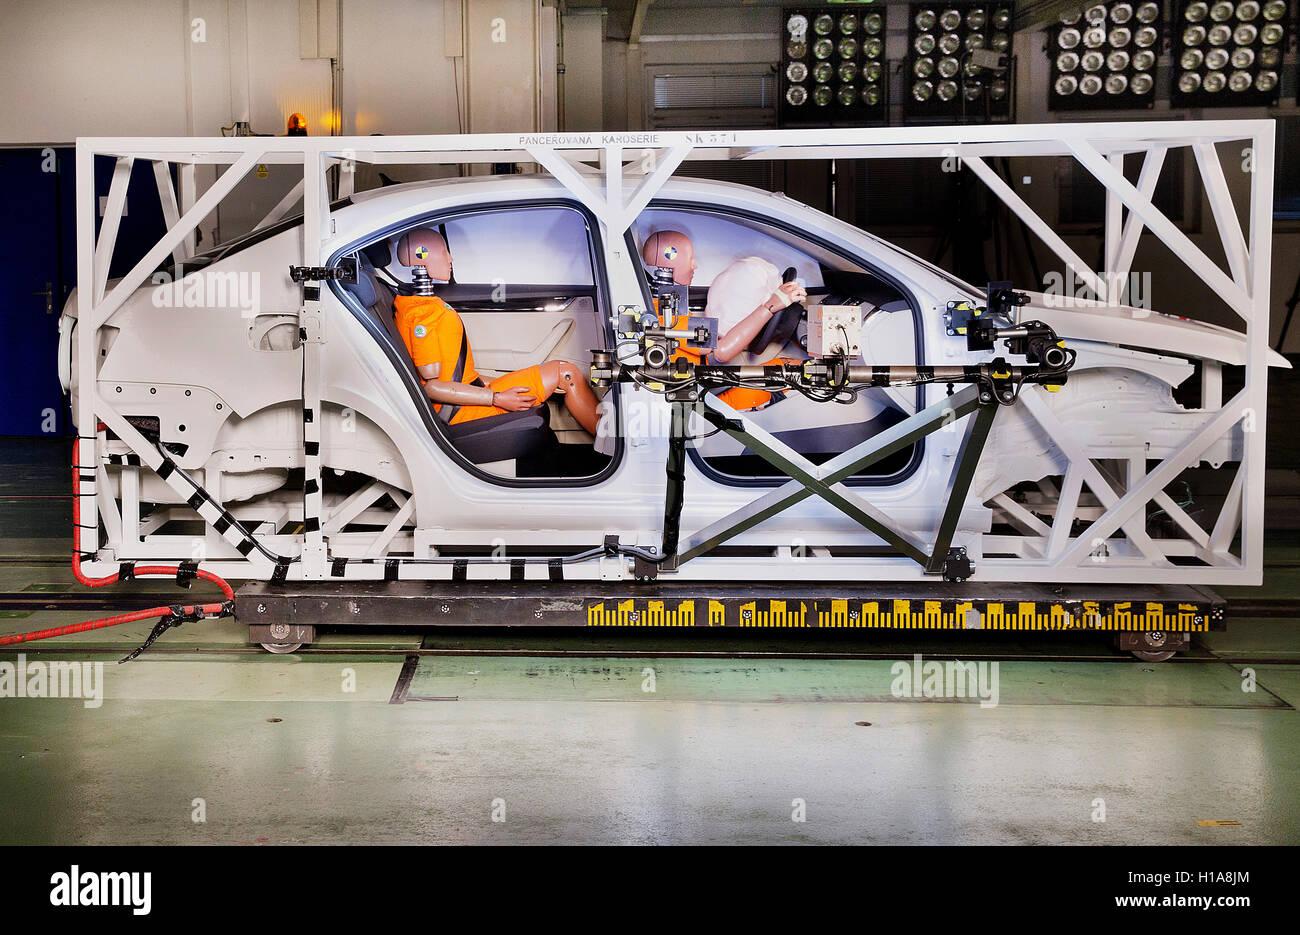 Skoda Auto, sled test, crash test dummy Oscar, seat belts